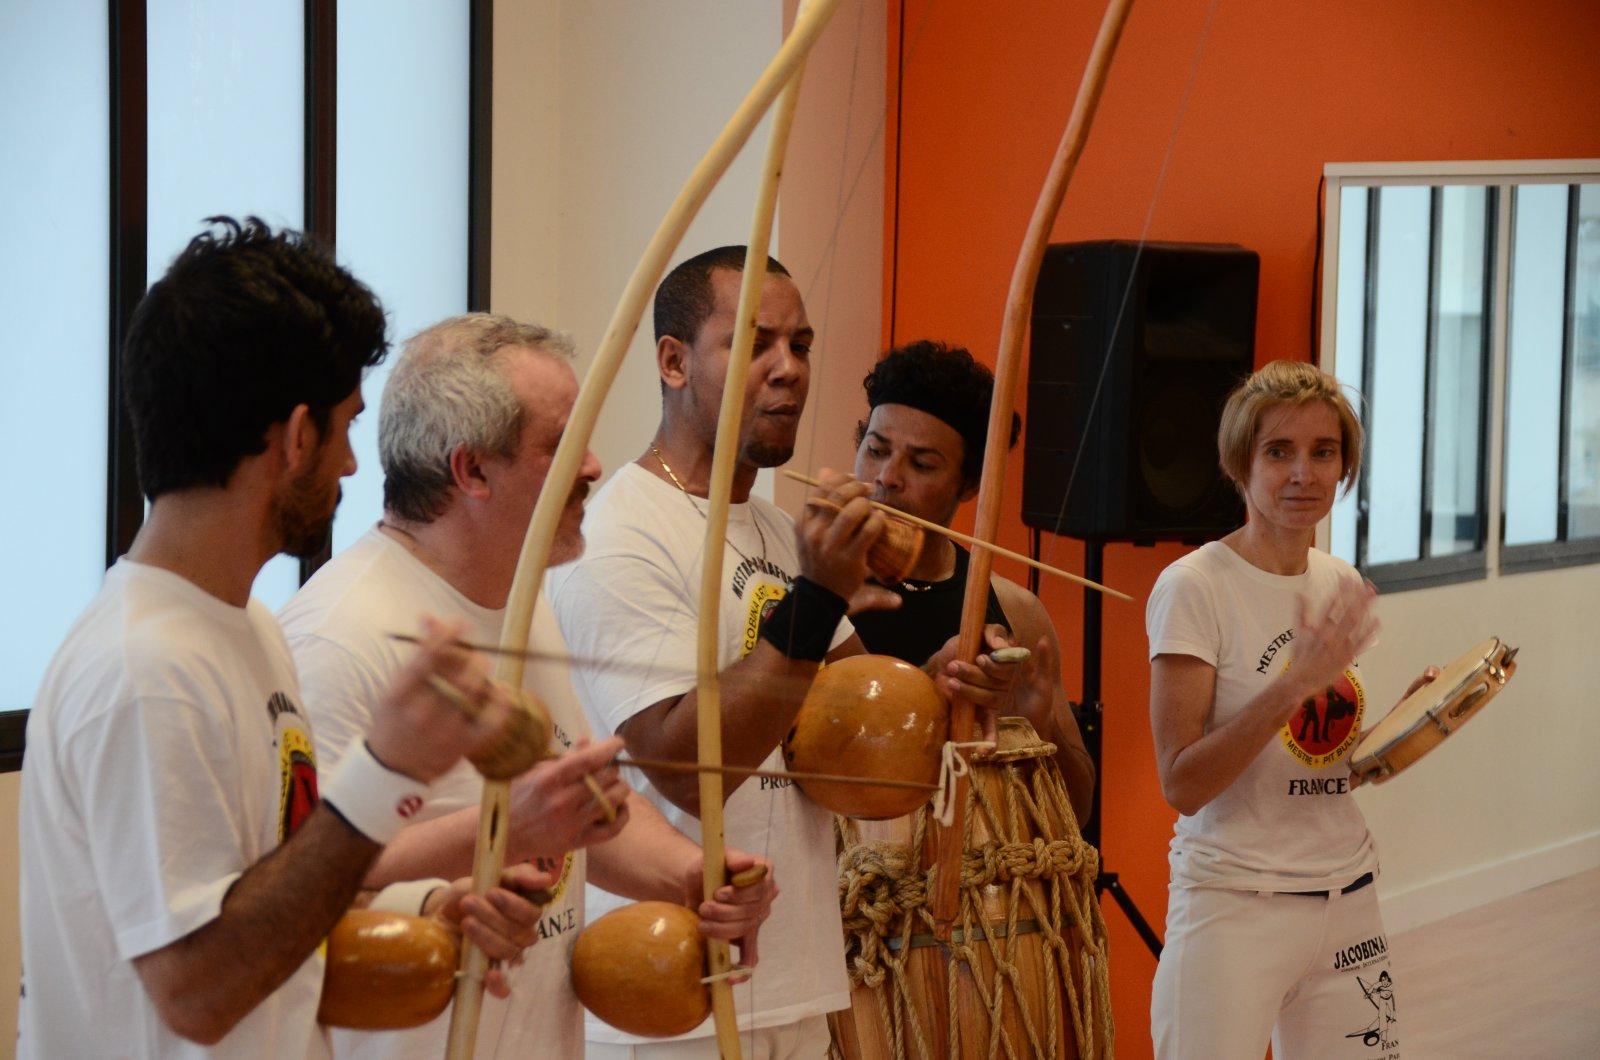 Roda E Galette 2018 Capoeira Nantes (57)